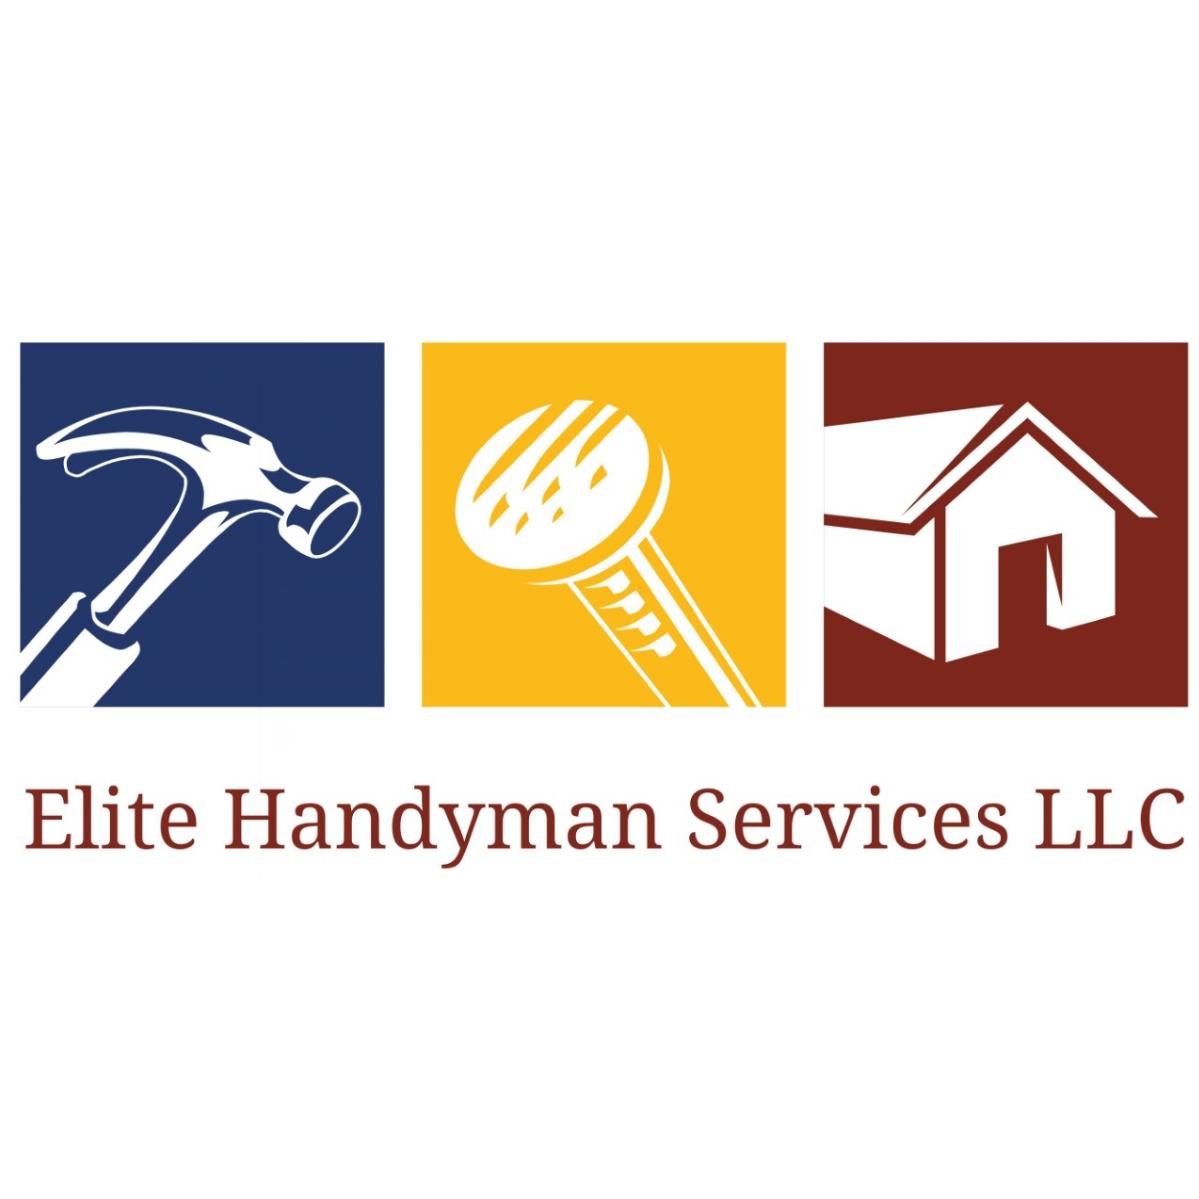 Elite Handyman Services LLC